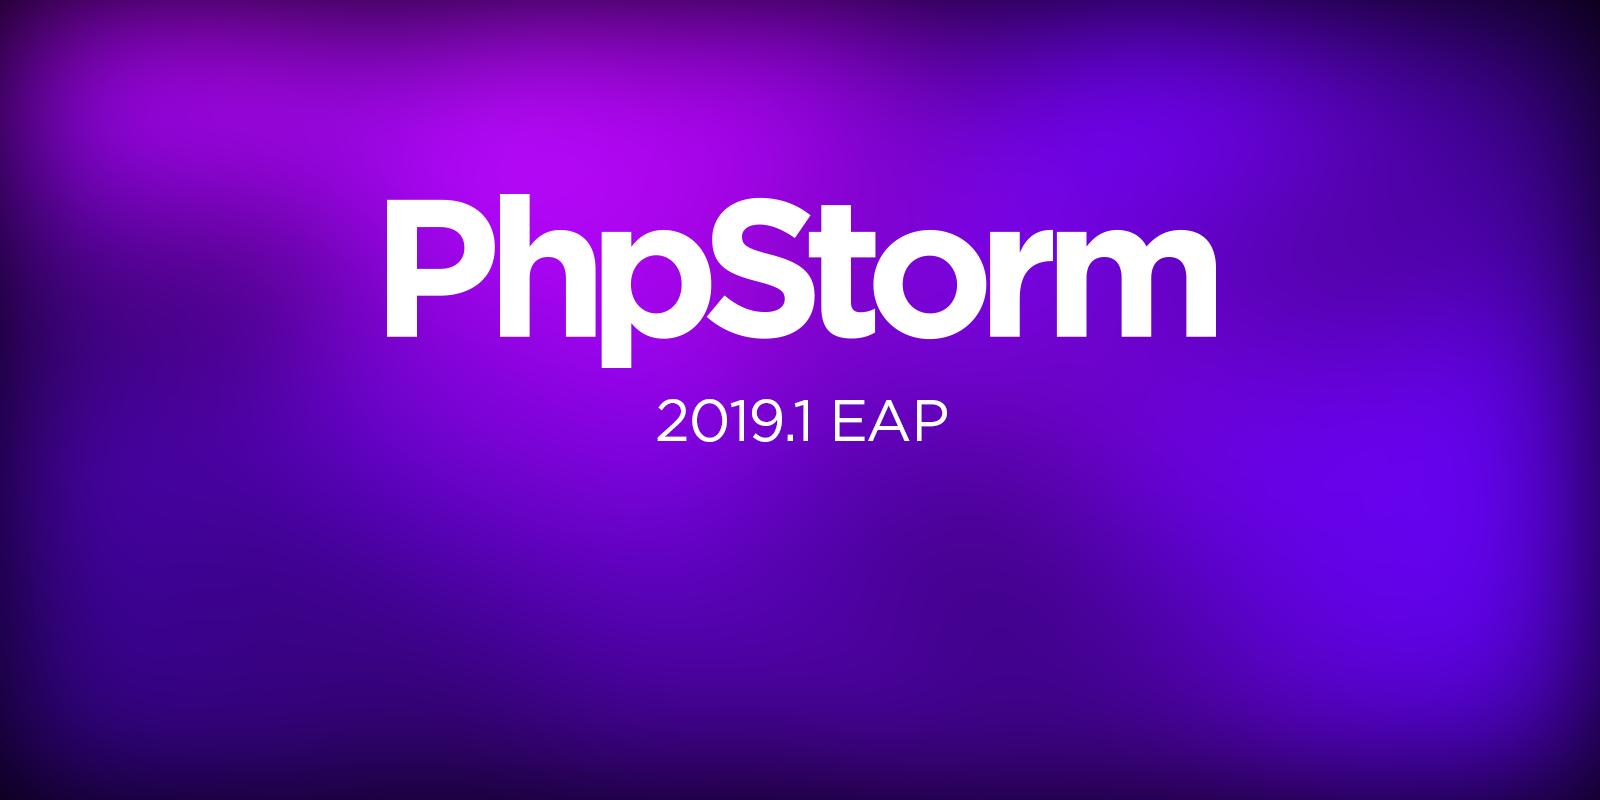 PhpStorm 2019.1 EAP